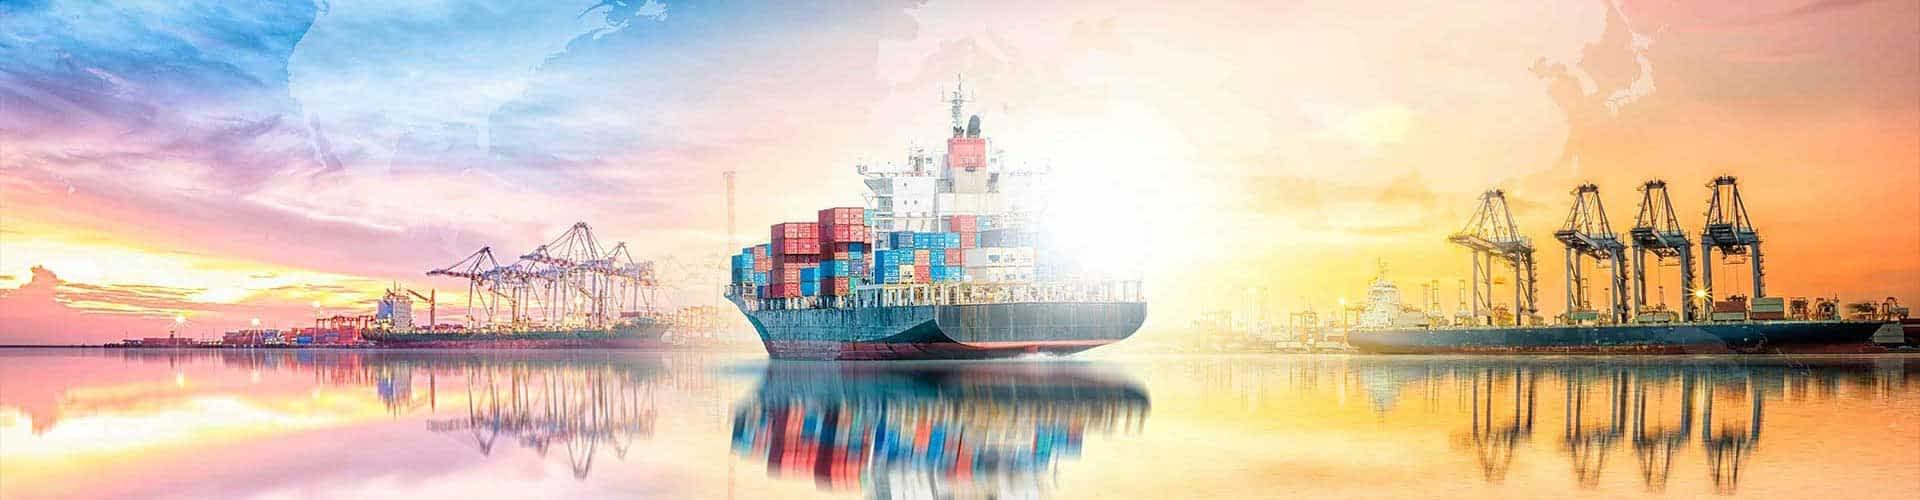 Offertanfrage Seefracht Offerte Sammelcontainer LCL - FCL